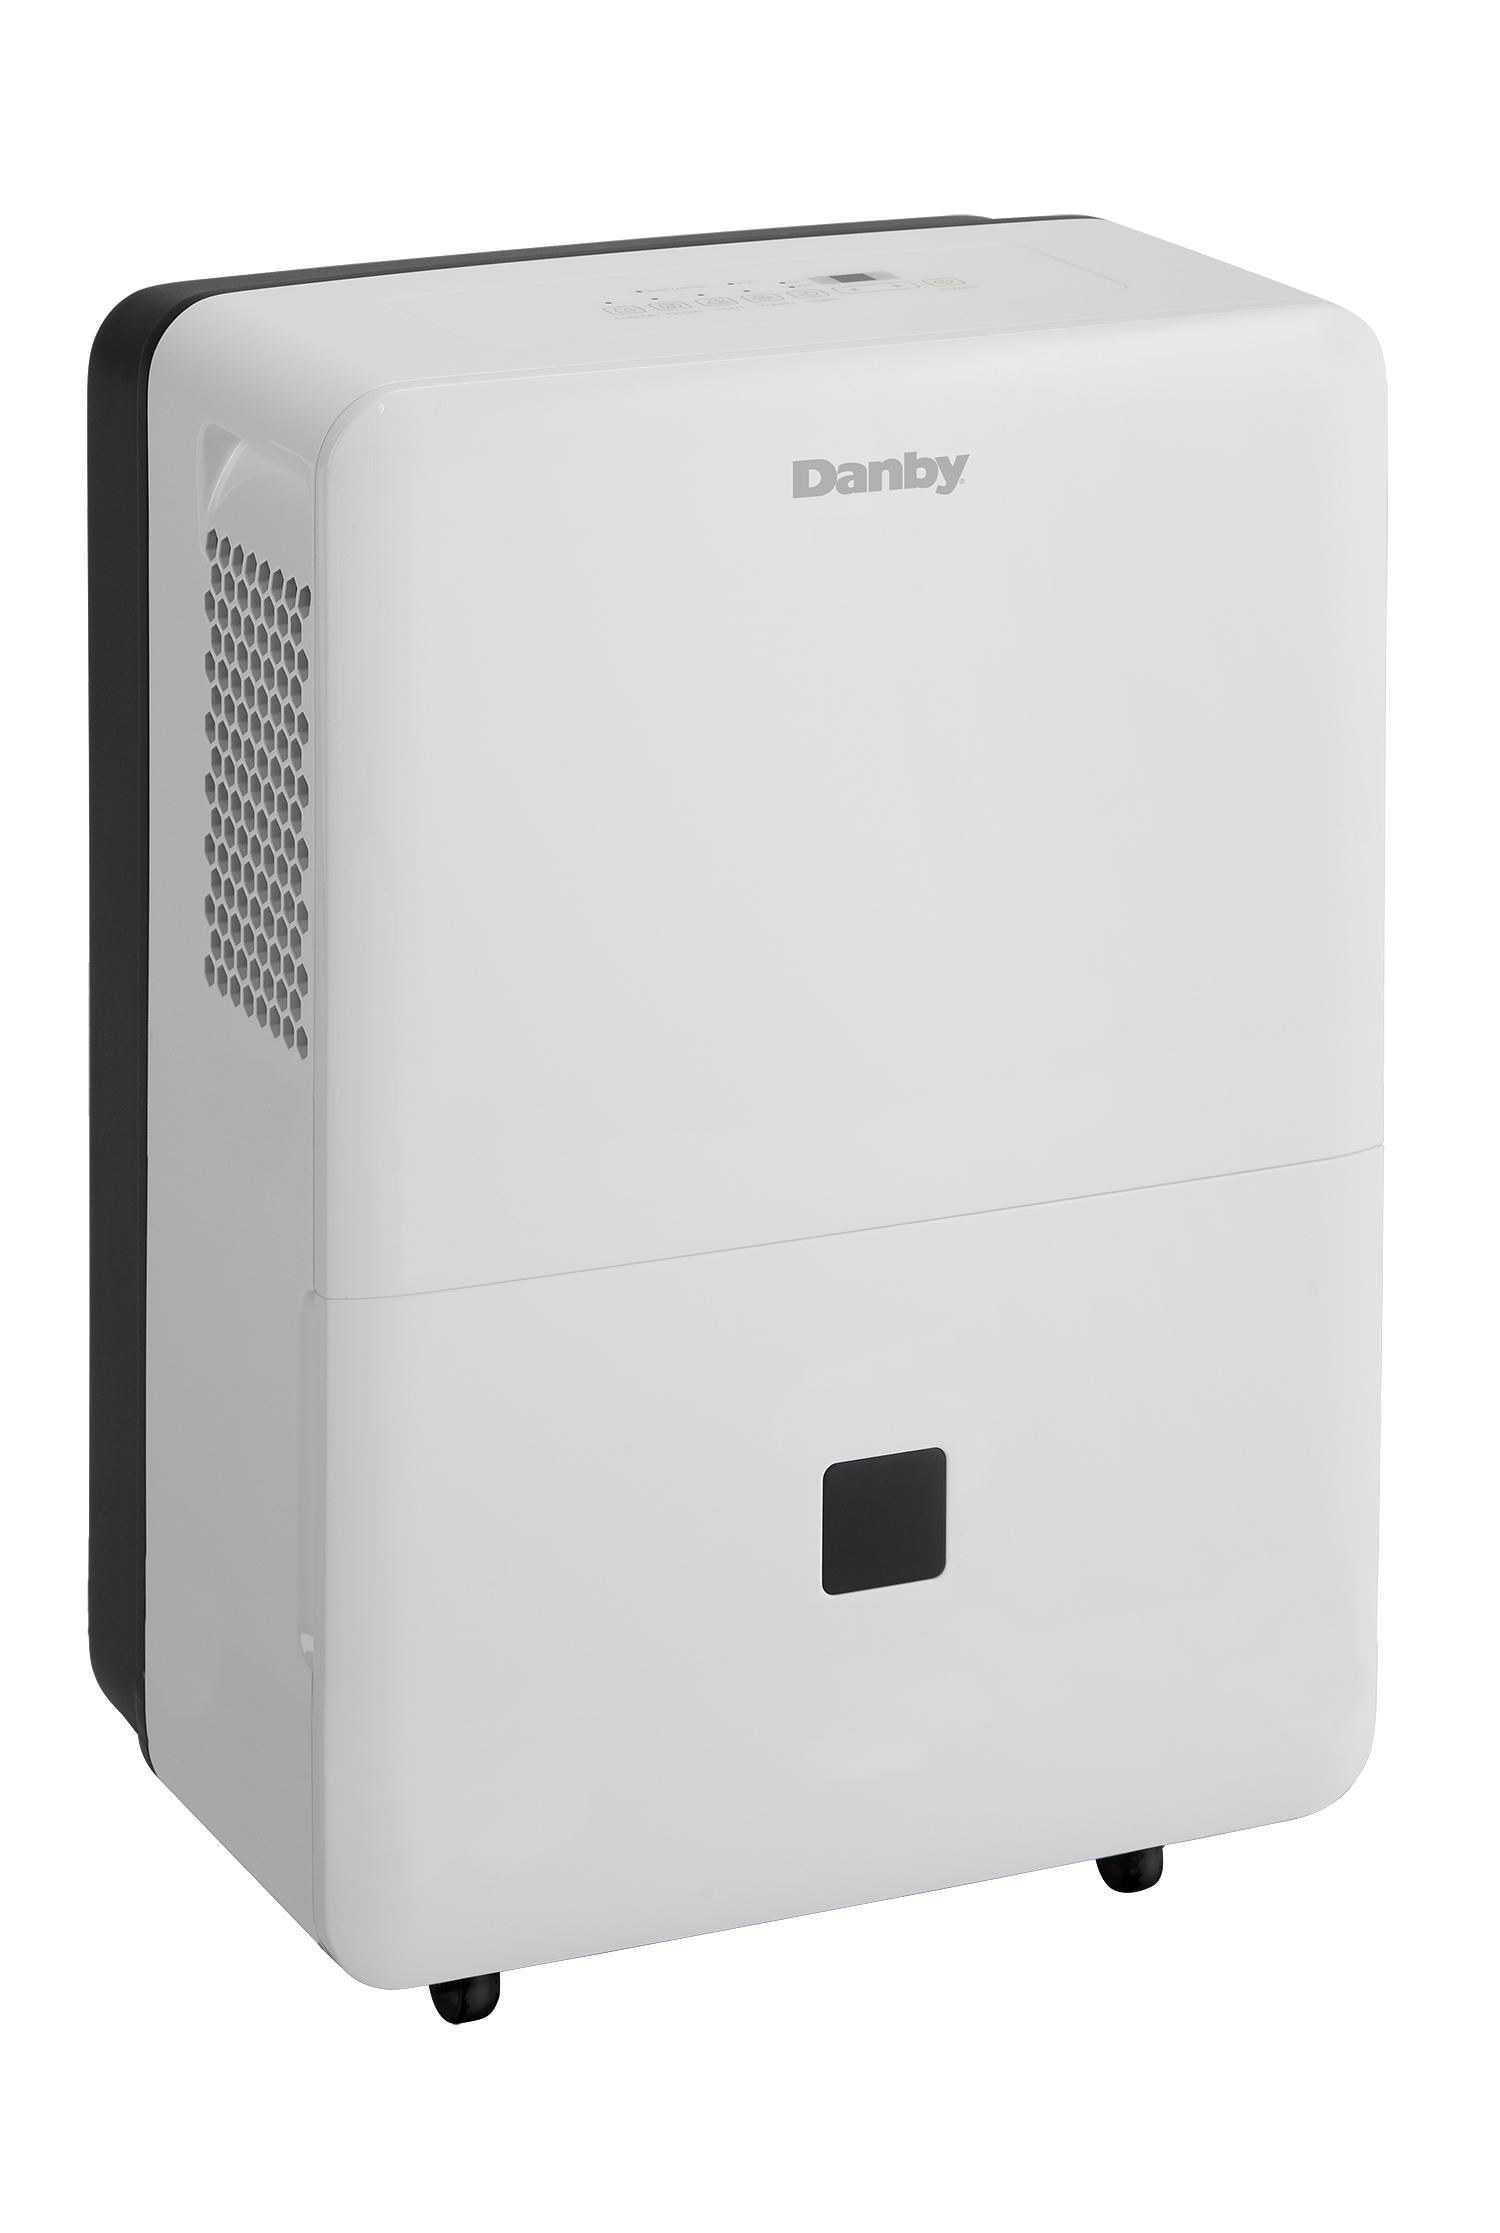 danby dehumidifier model ddr60a1cp manual